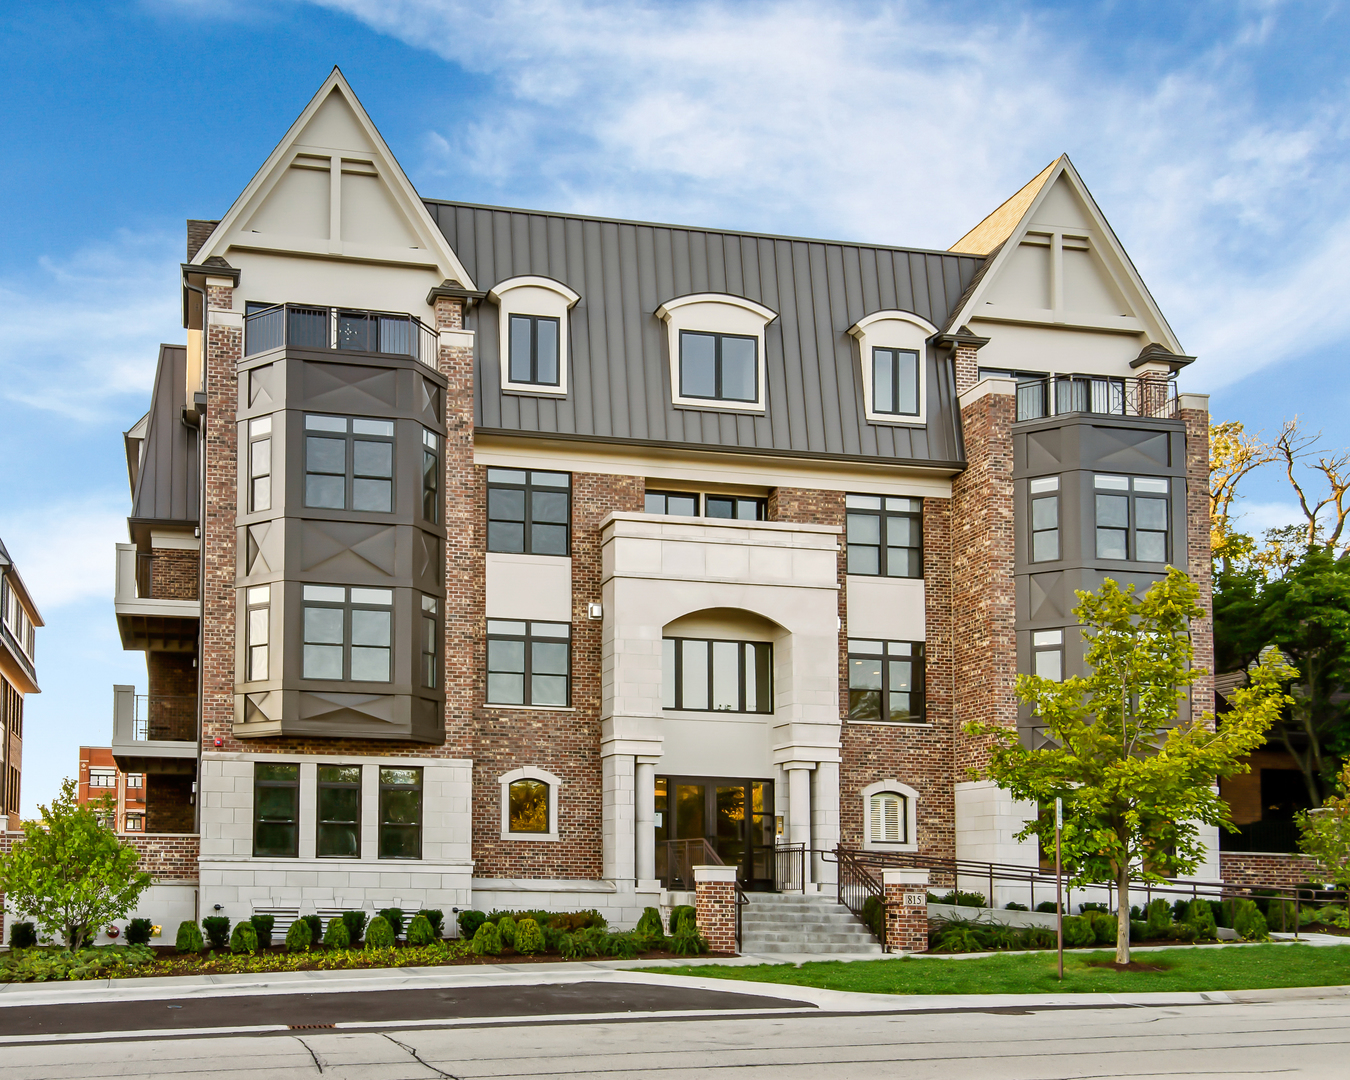 815 Laurel Avenue, Highland Park, Illinois